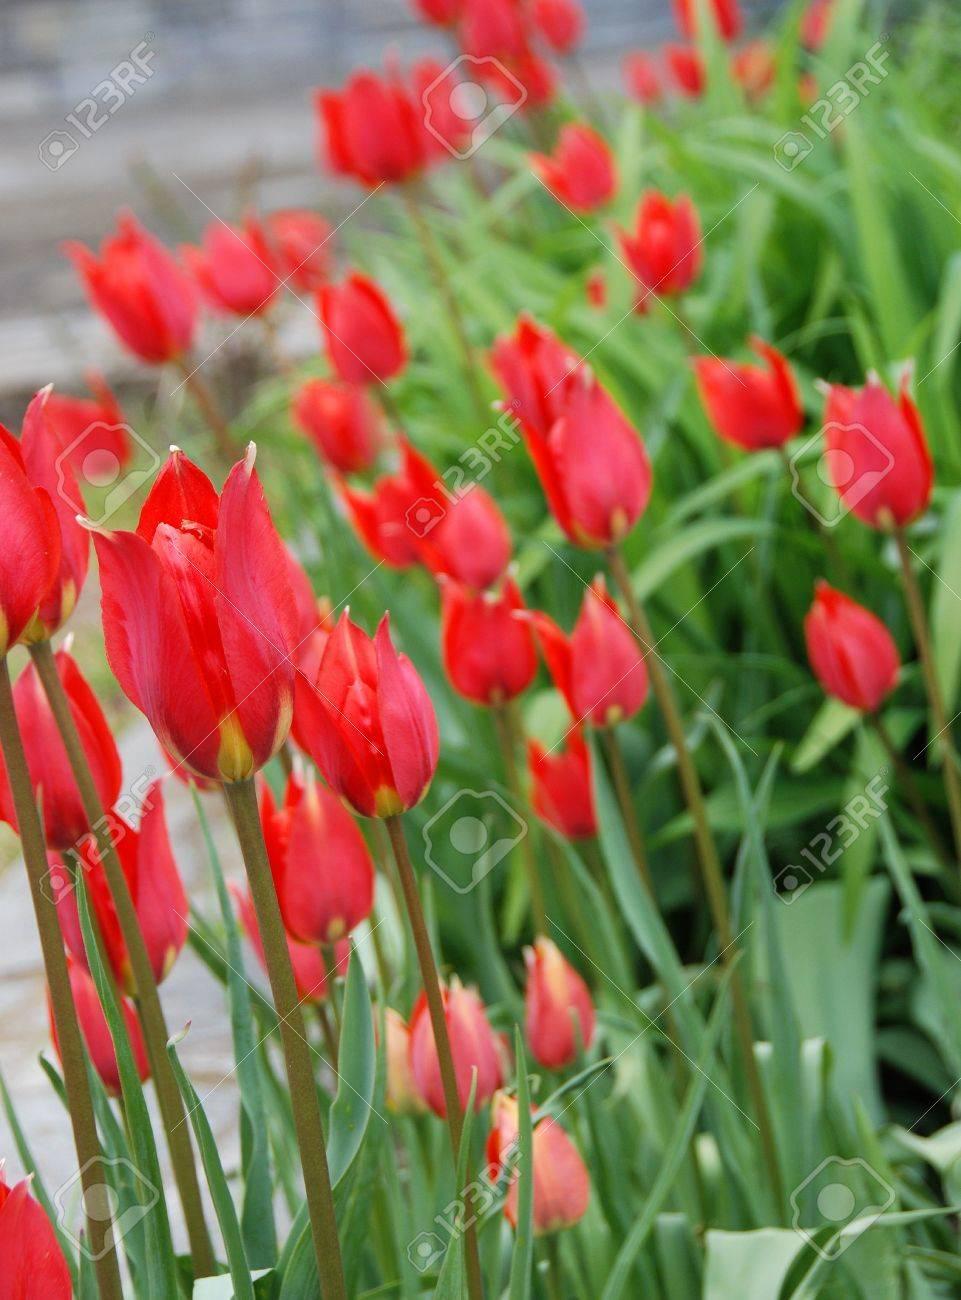 Garden of red tulips Stock Photo - 2231102